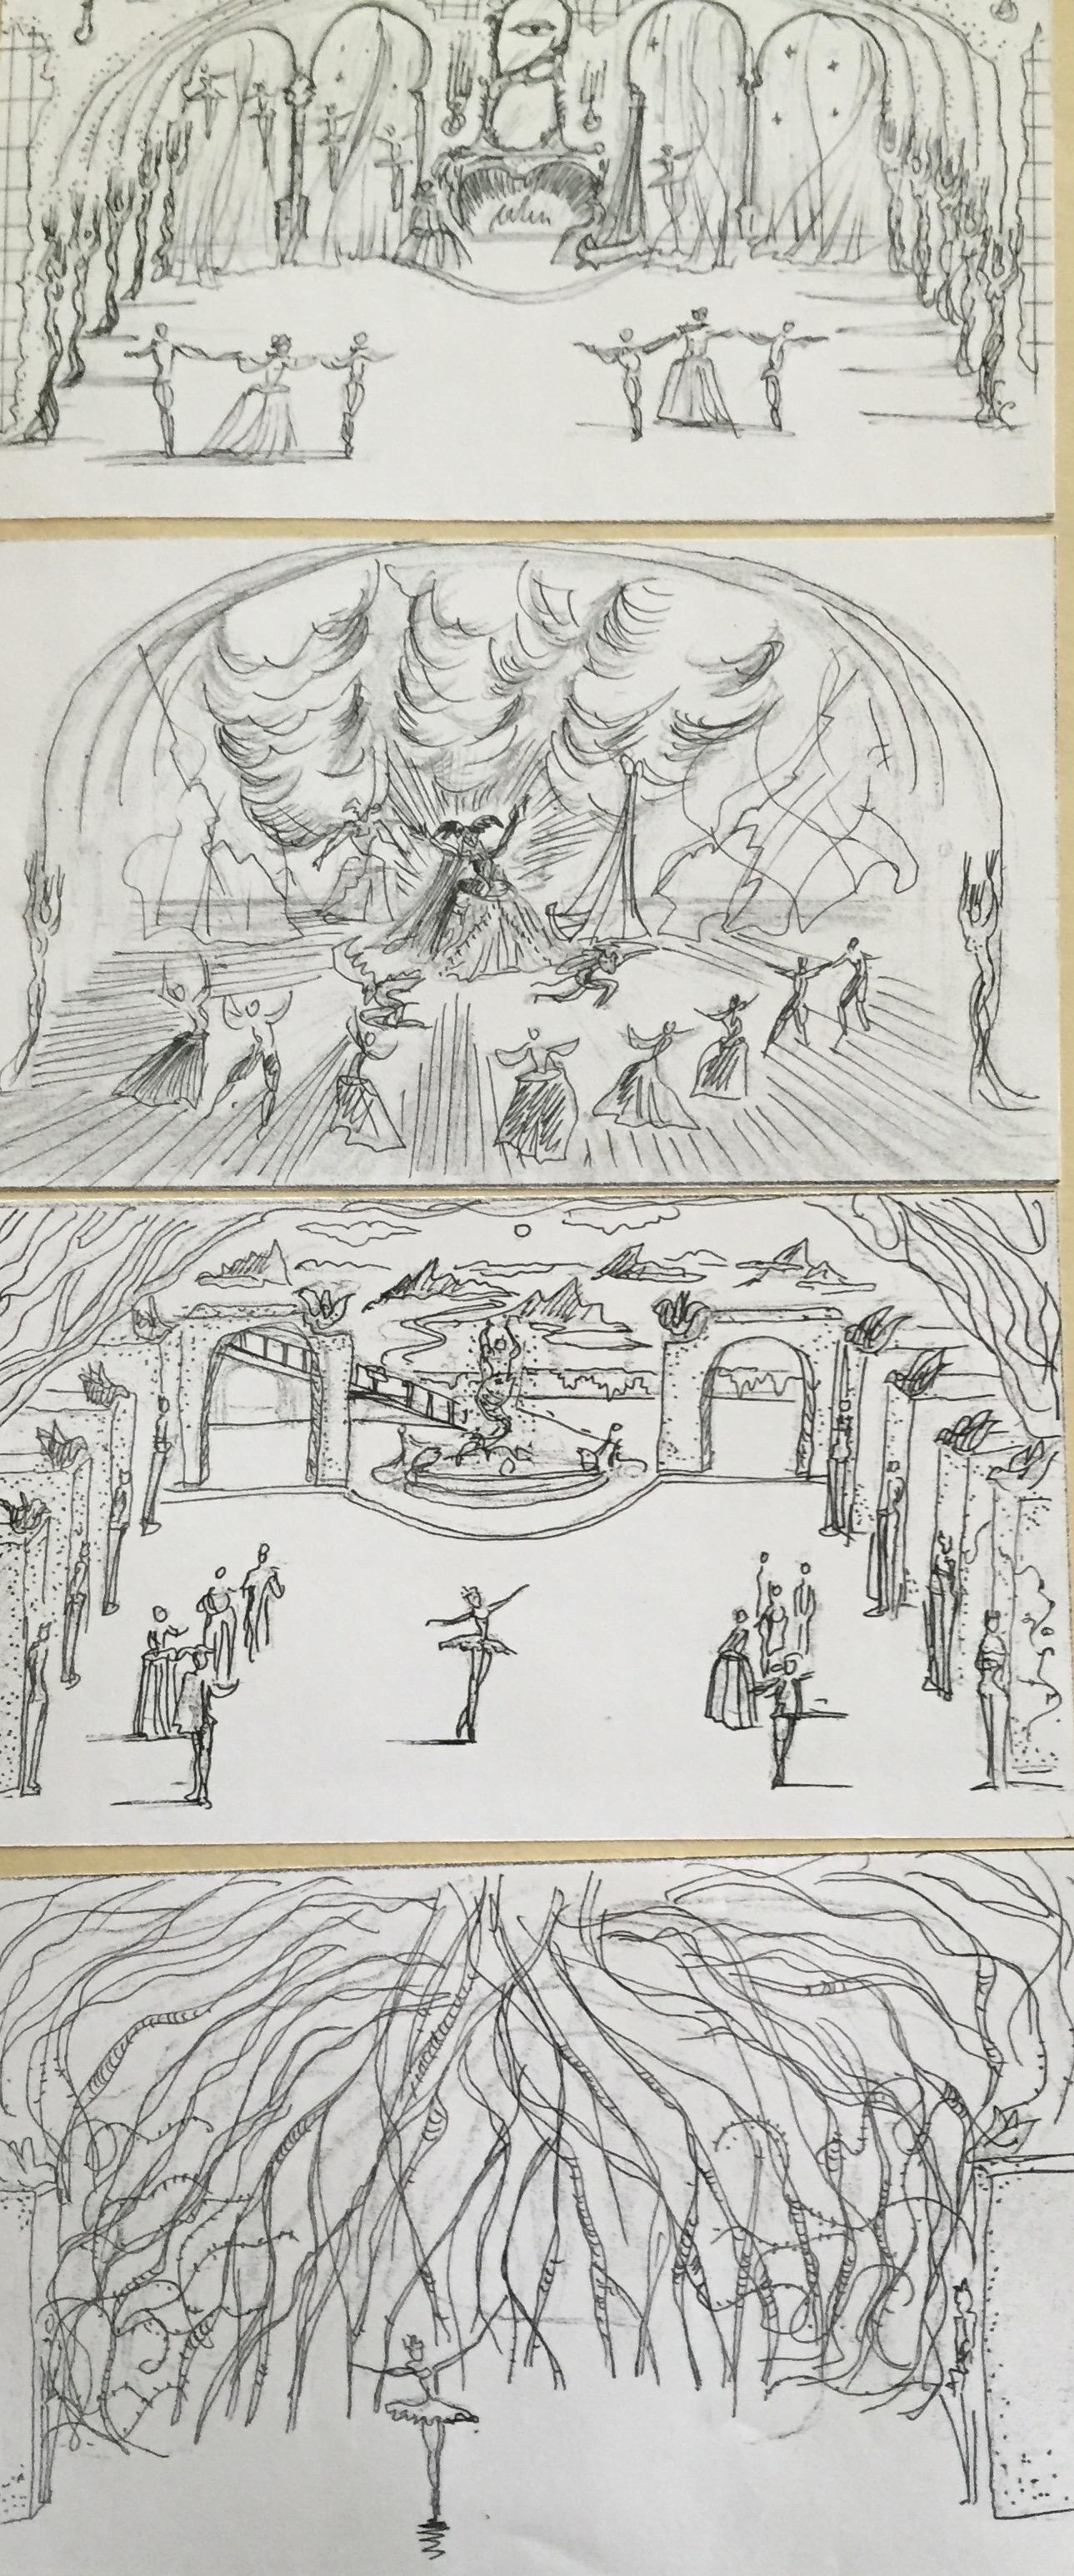 Sleeping Beauty ballet - producction design - David Roger 11.jpg